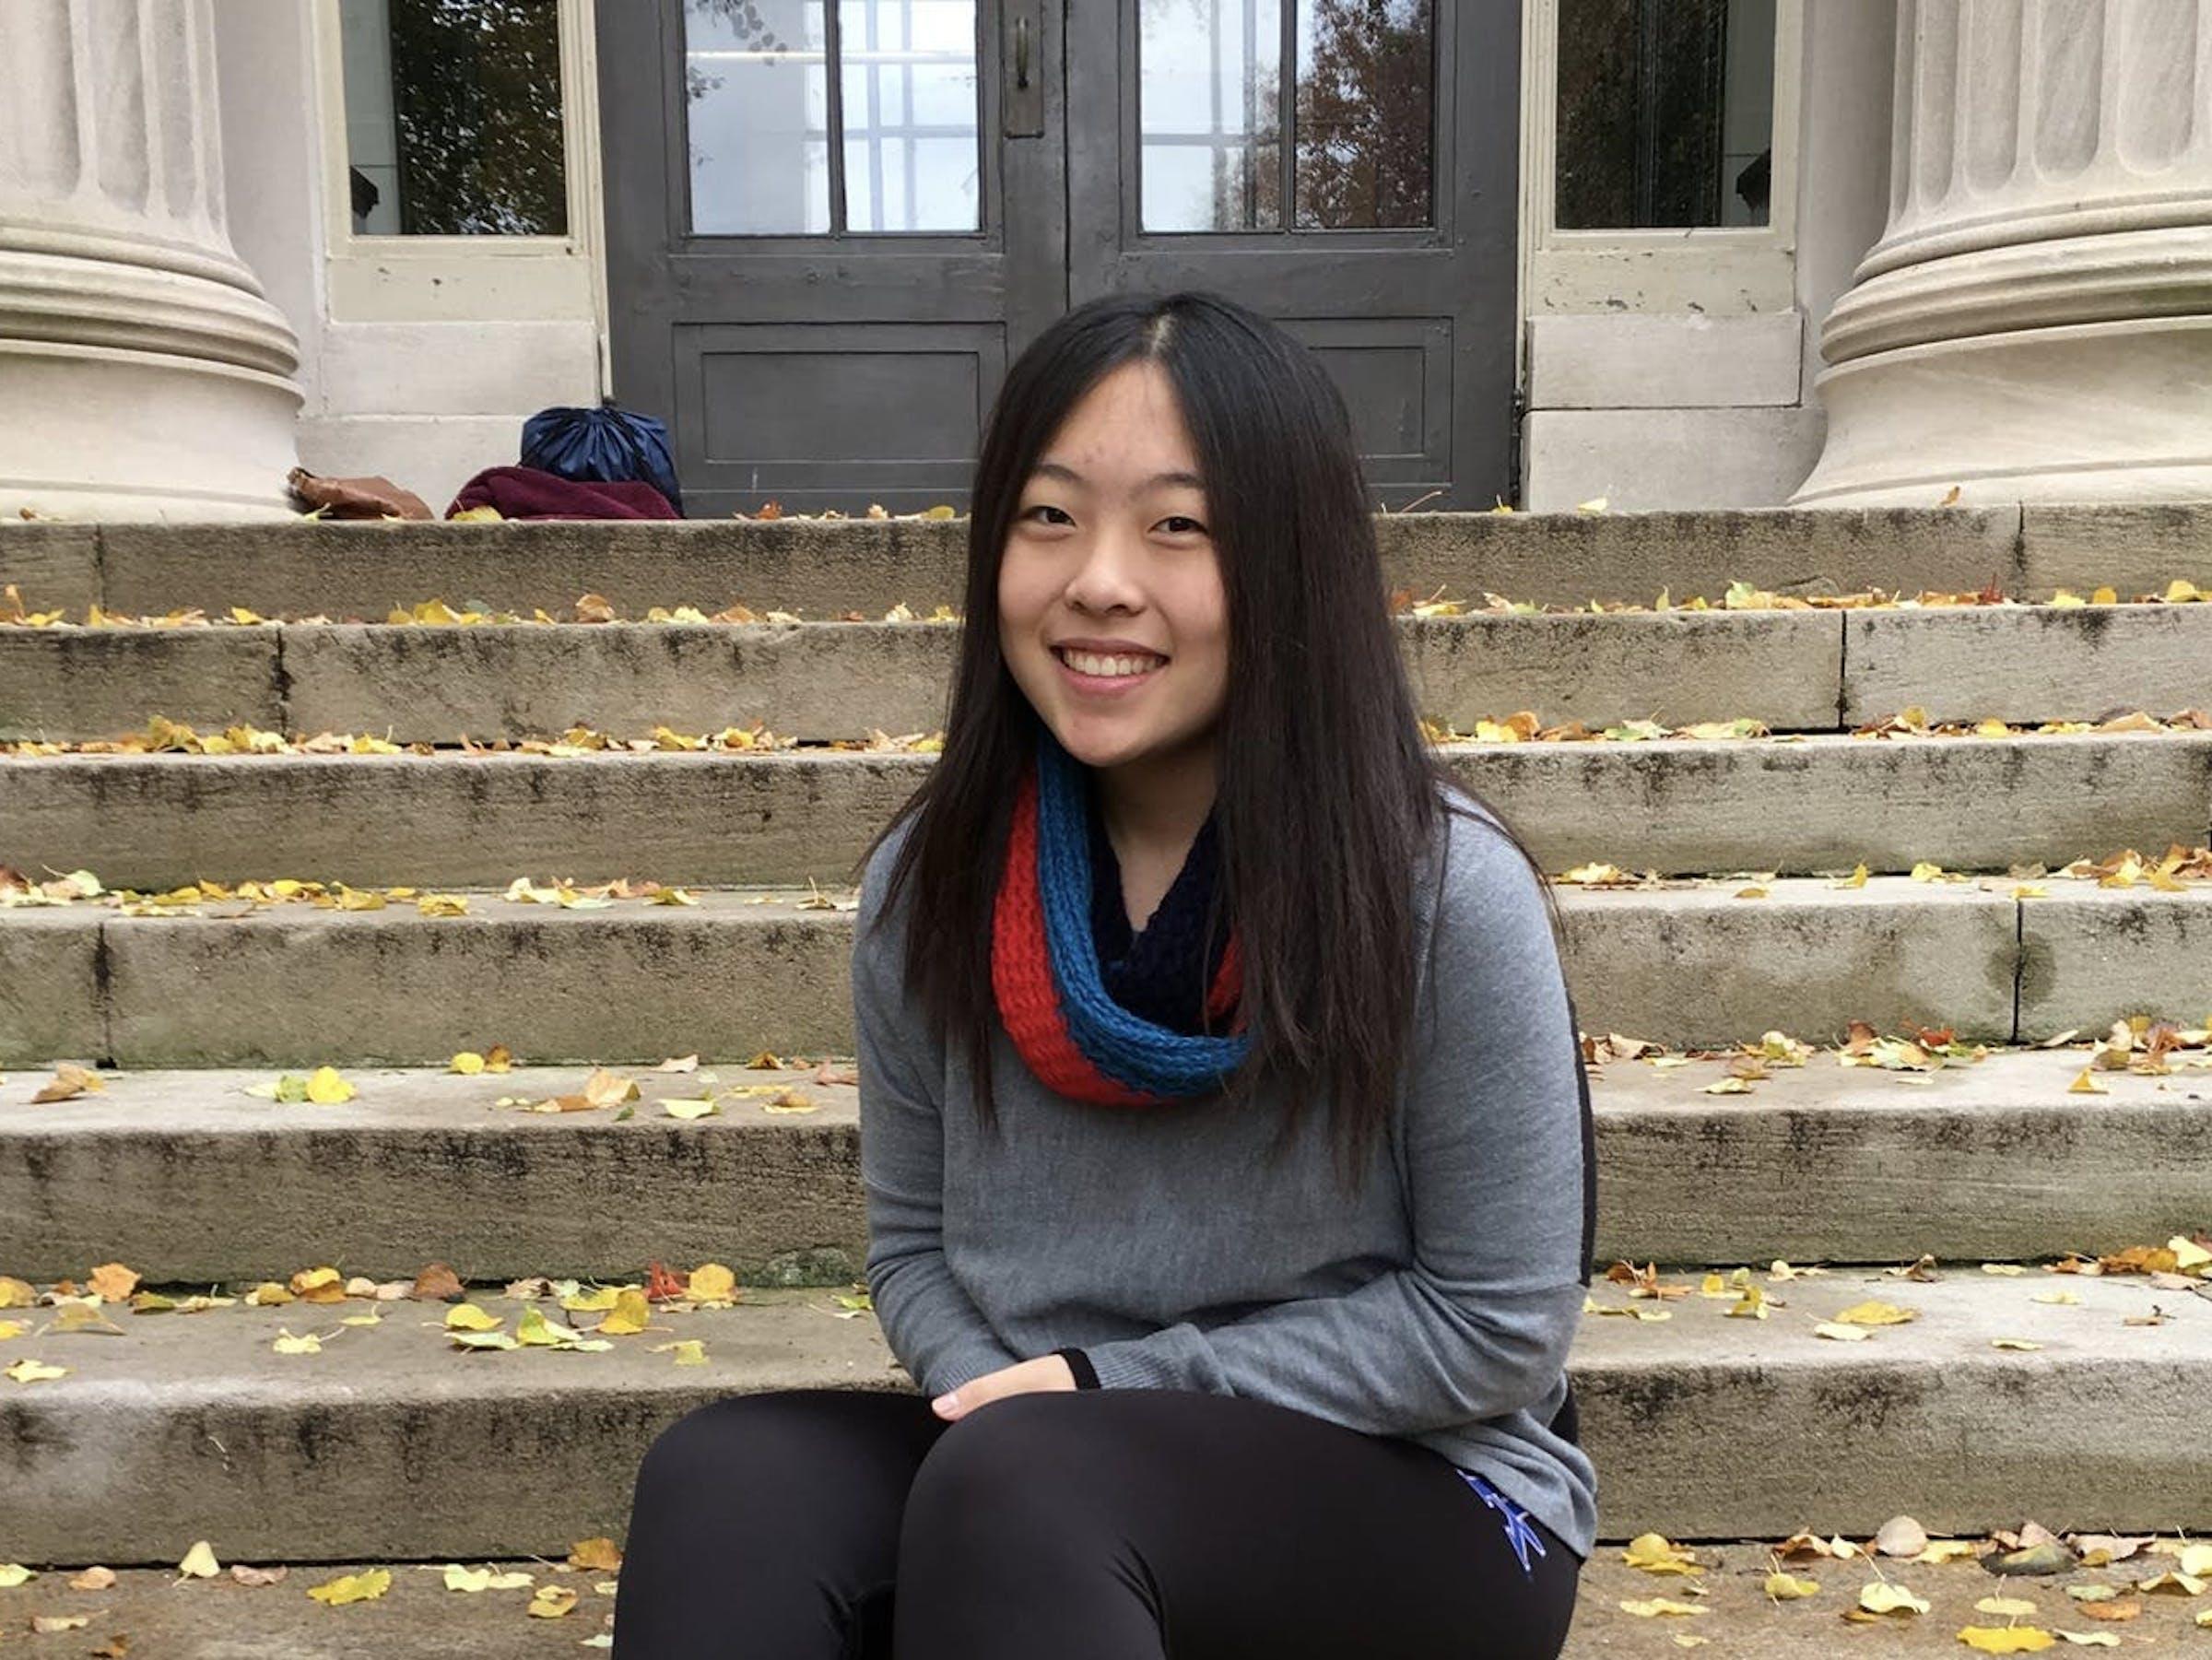 Helen Pang